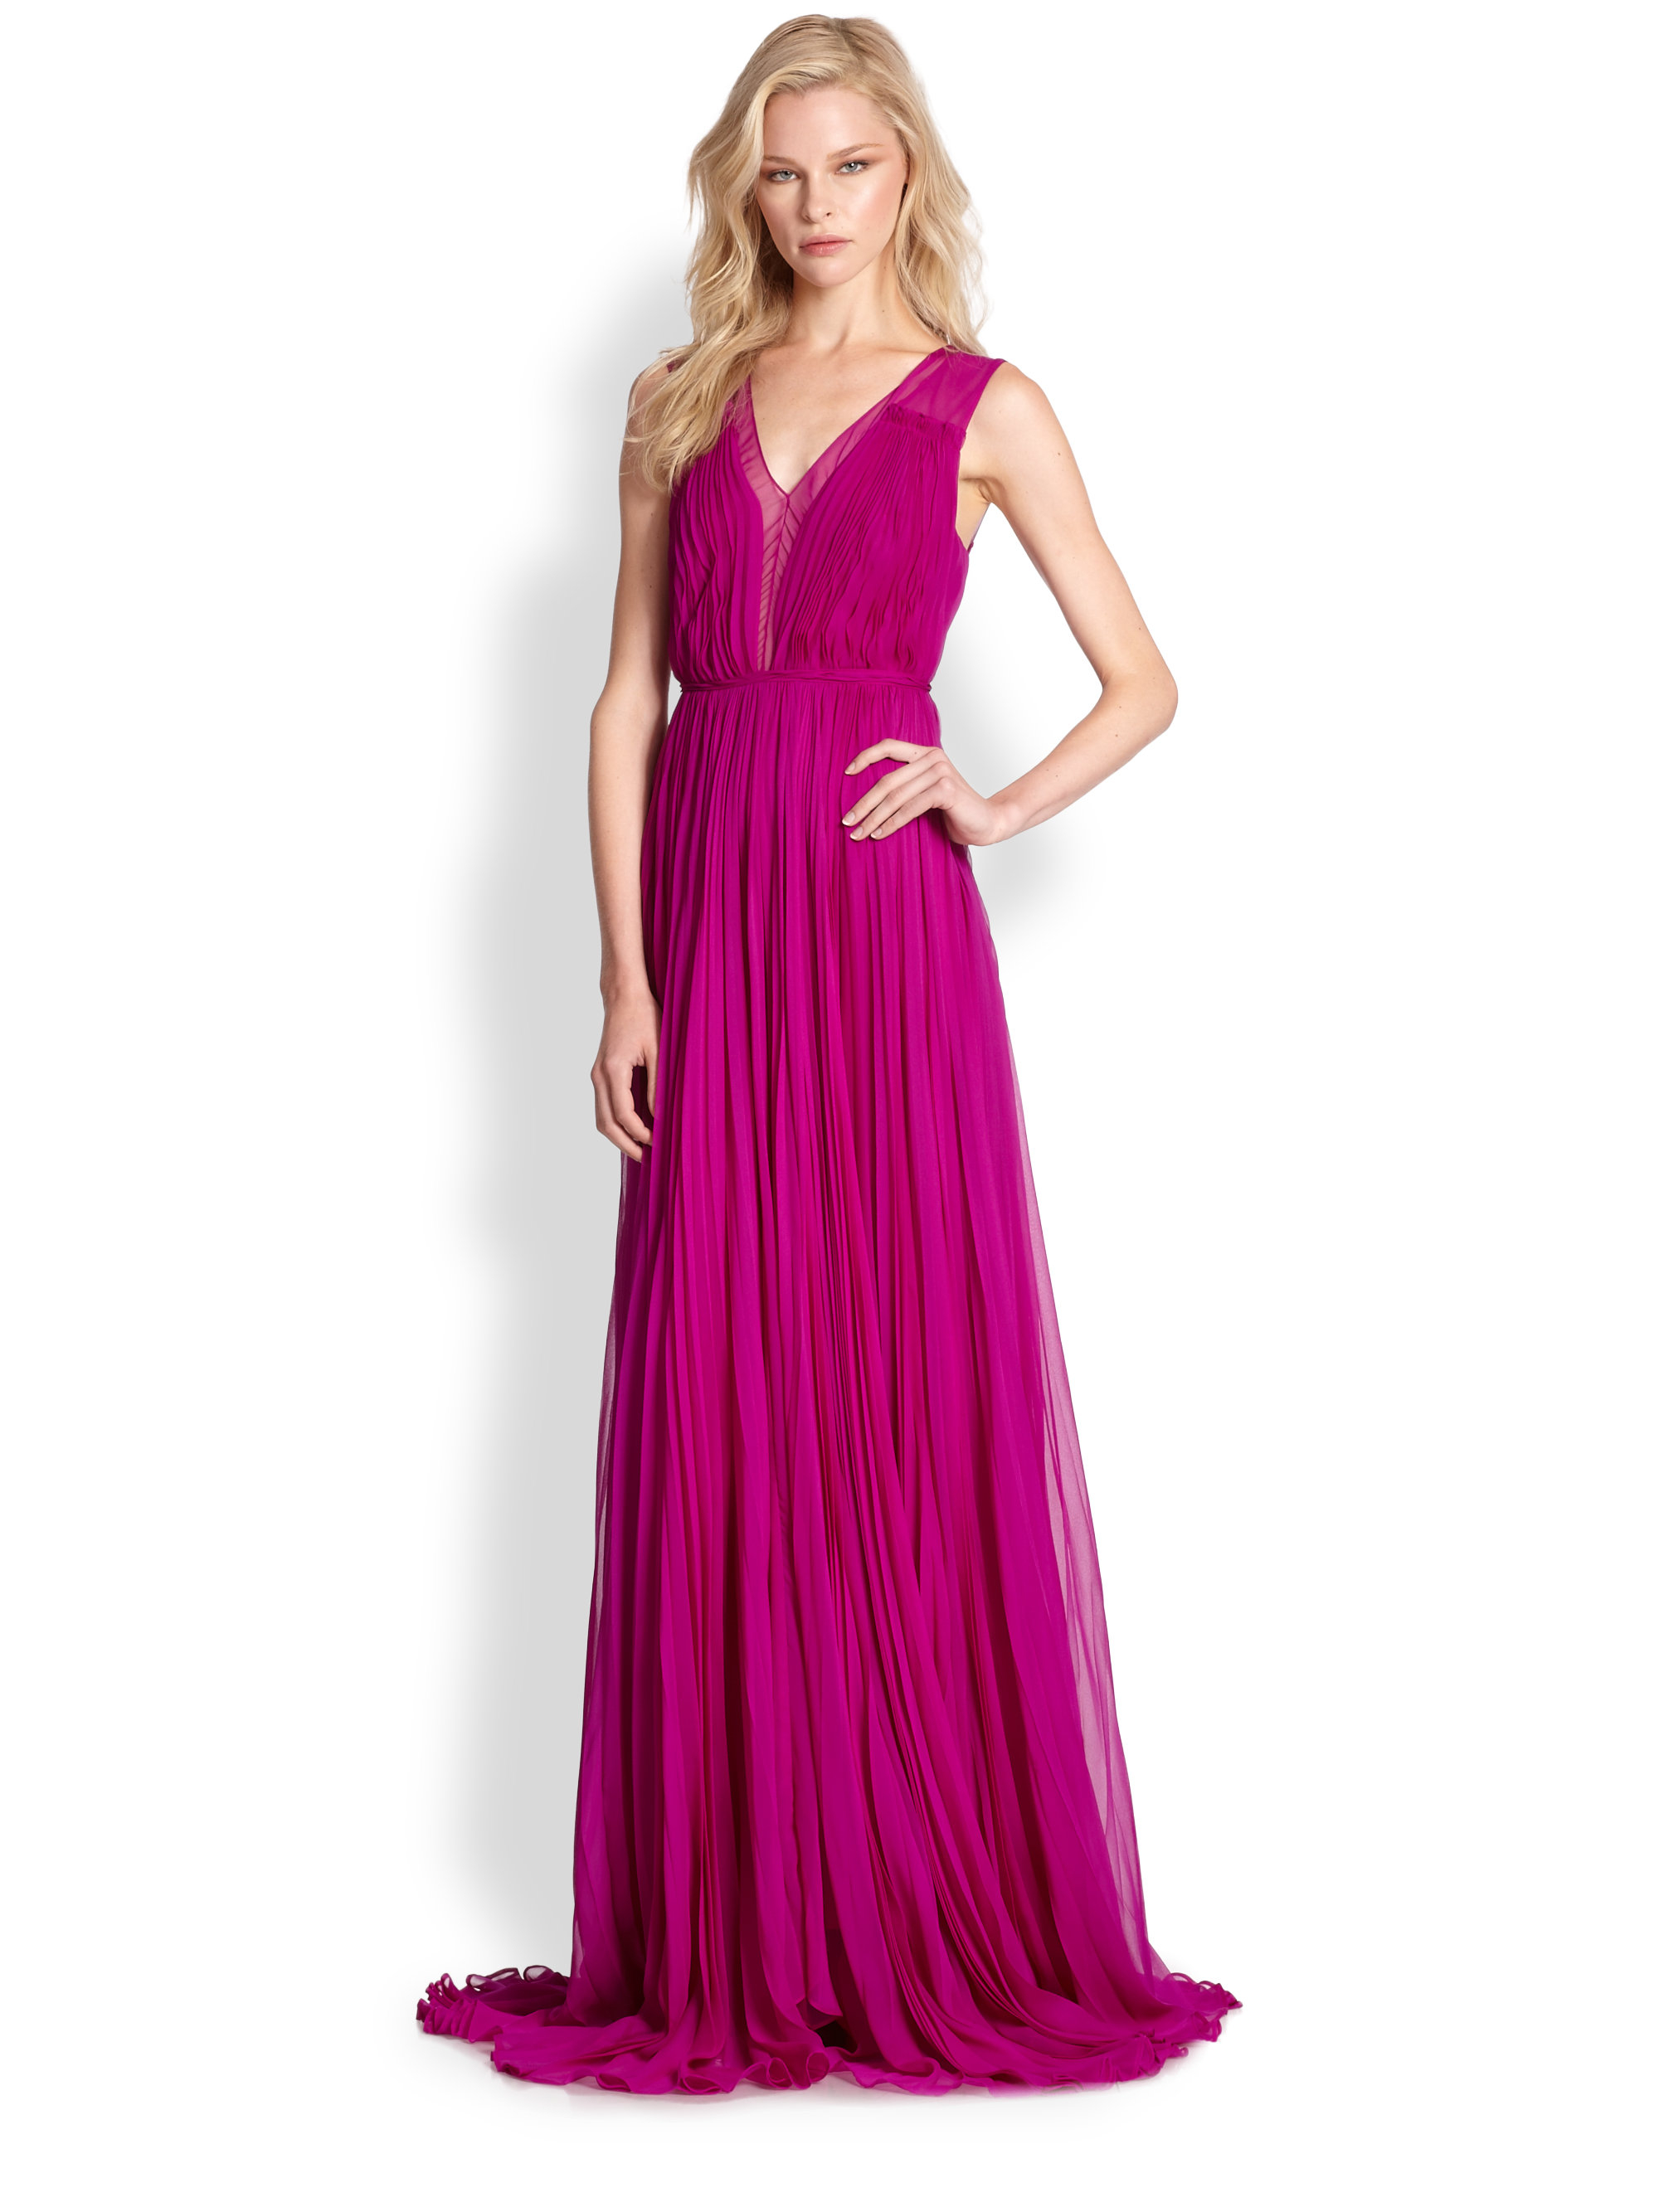 Lyst - Rebecca Taylor Shirred Chiffon Gown in Purple